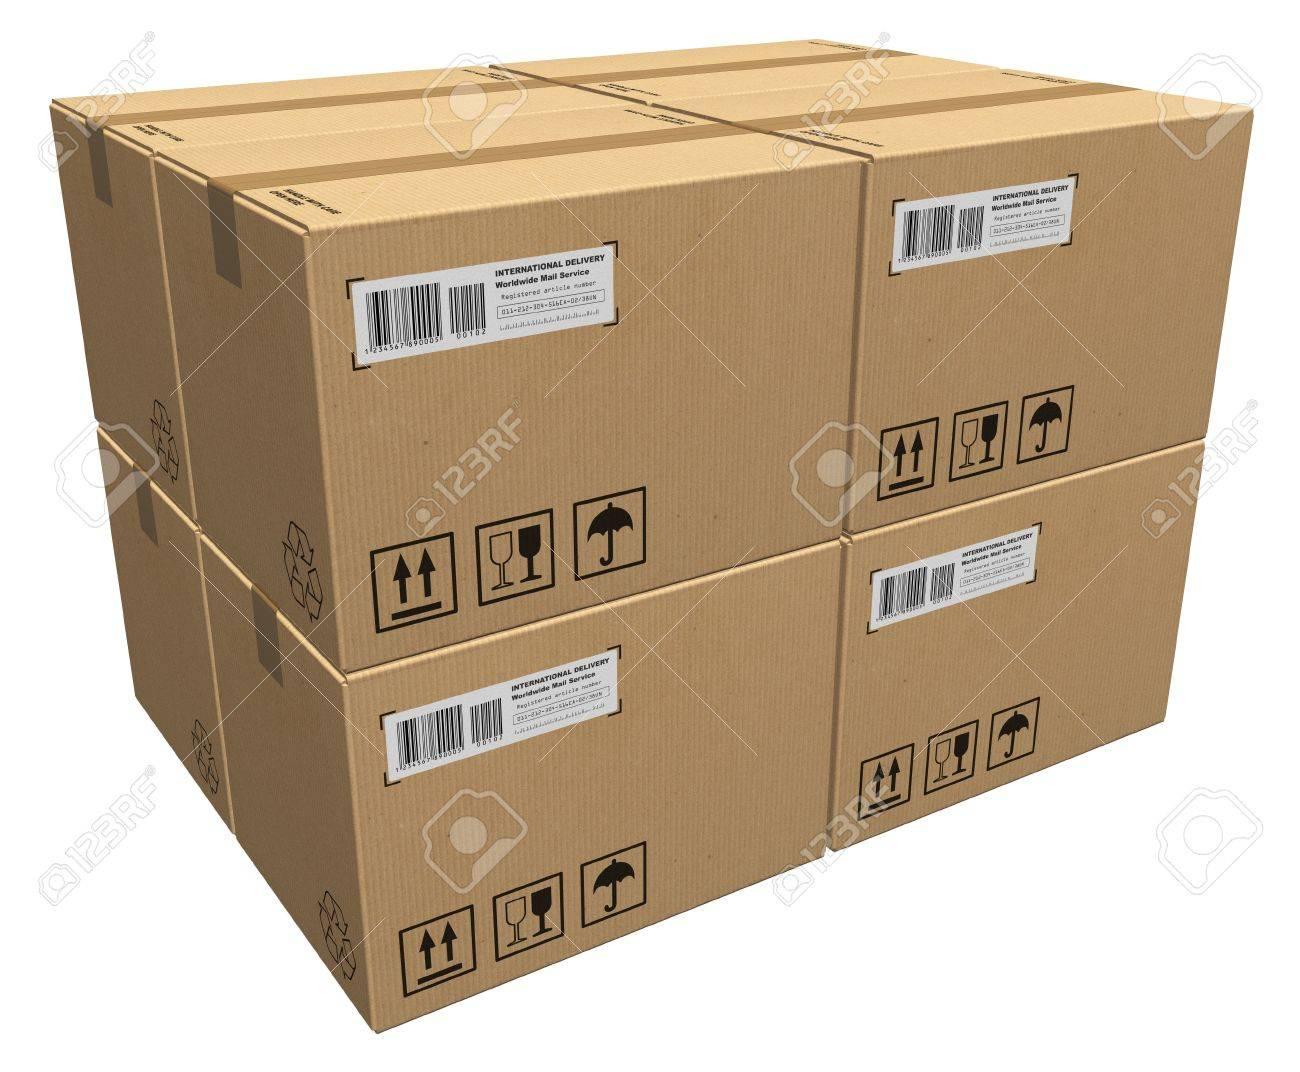 Cardboard boxes Stock Photo - 8424406